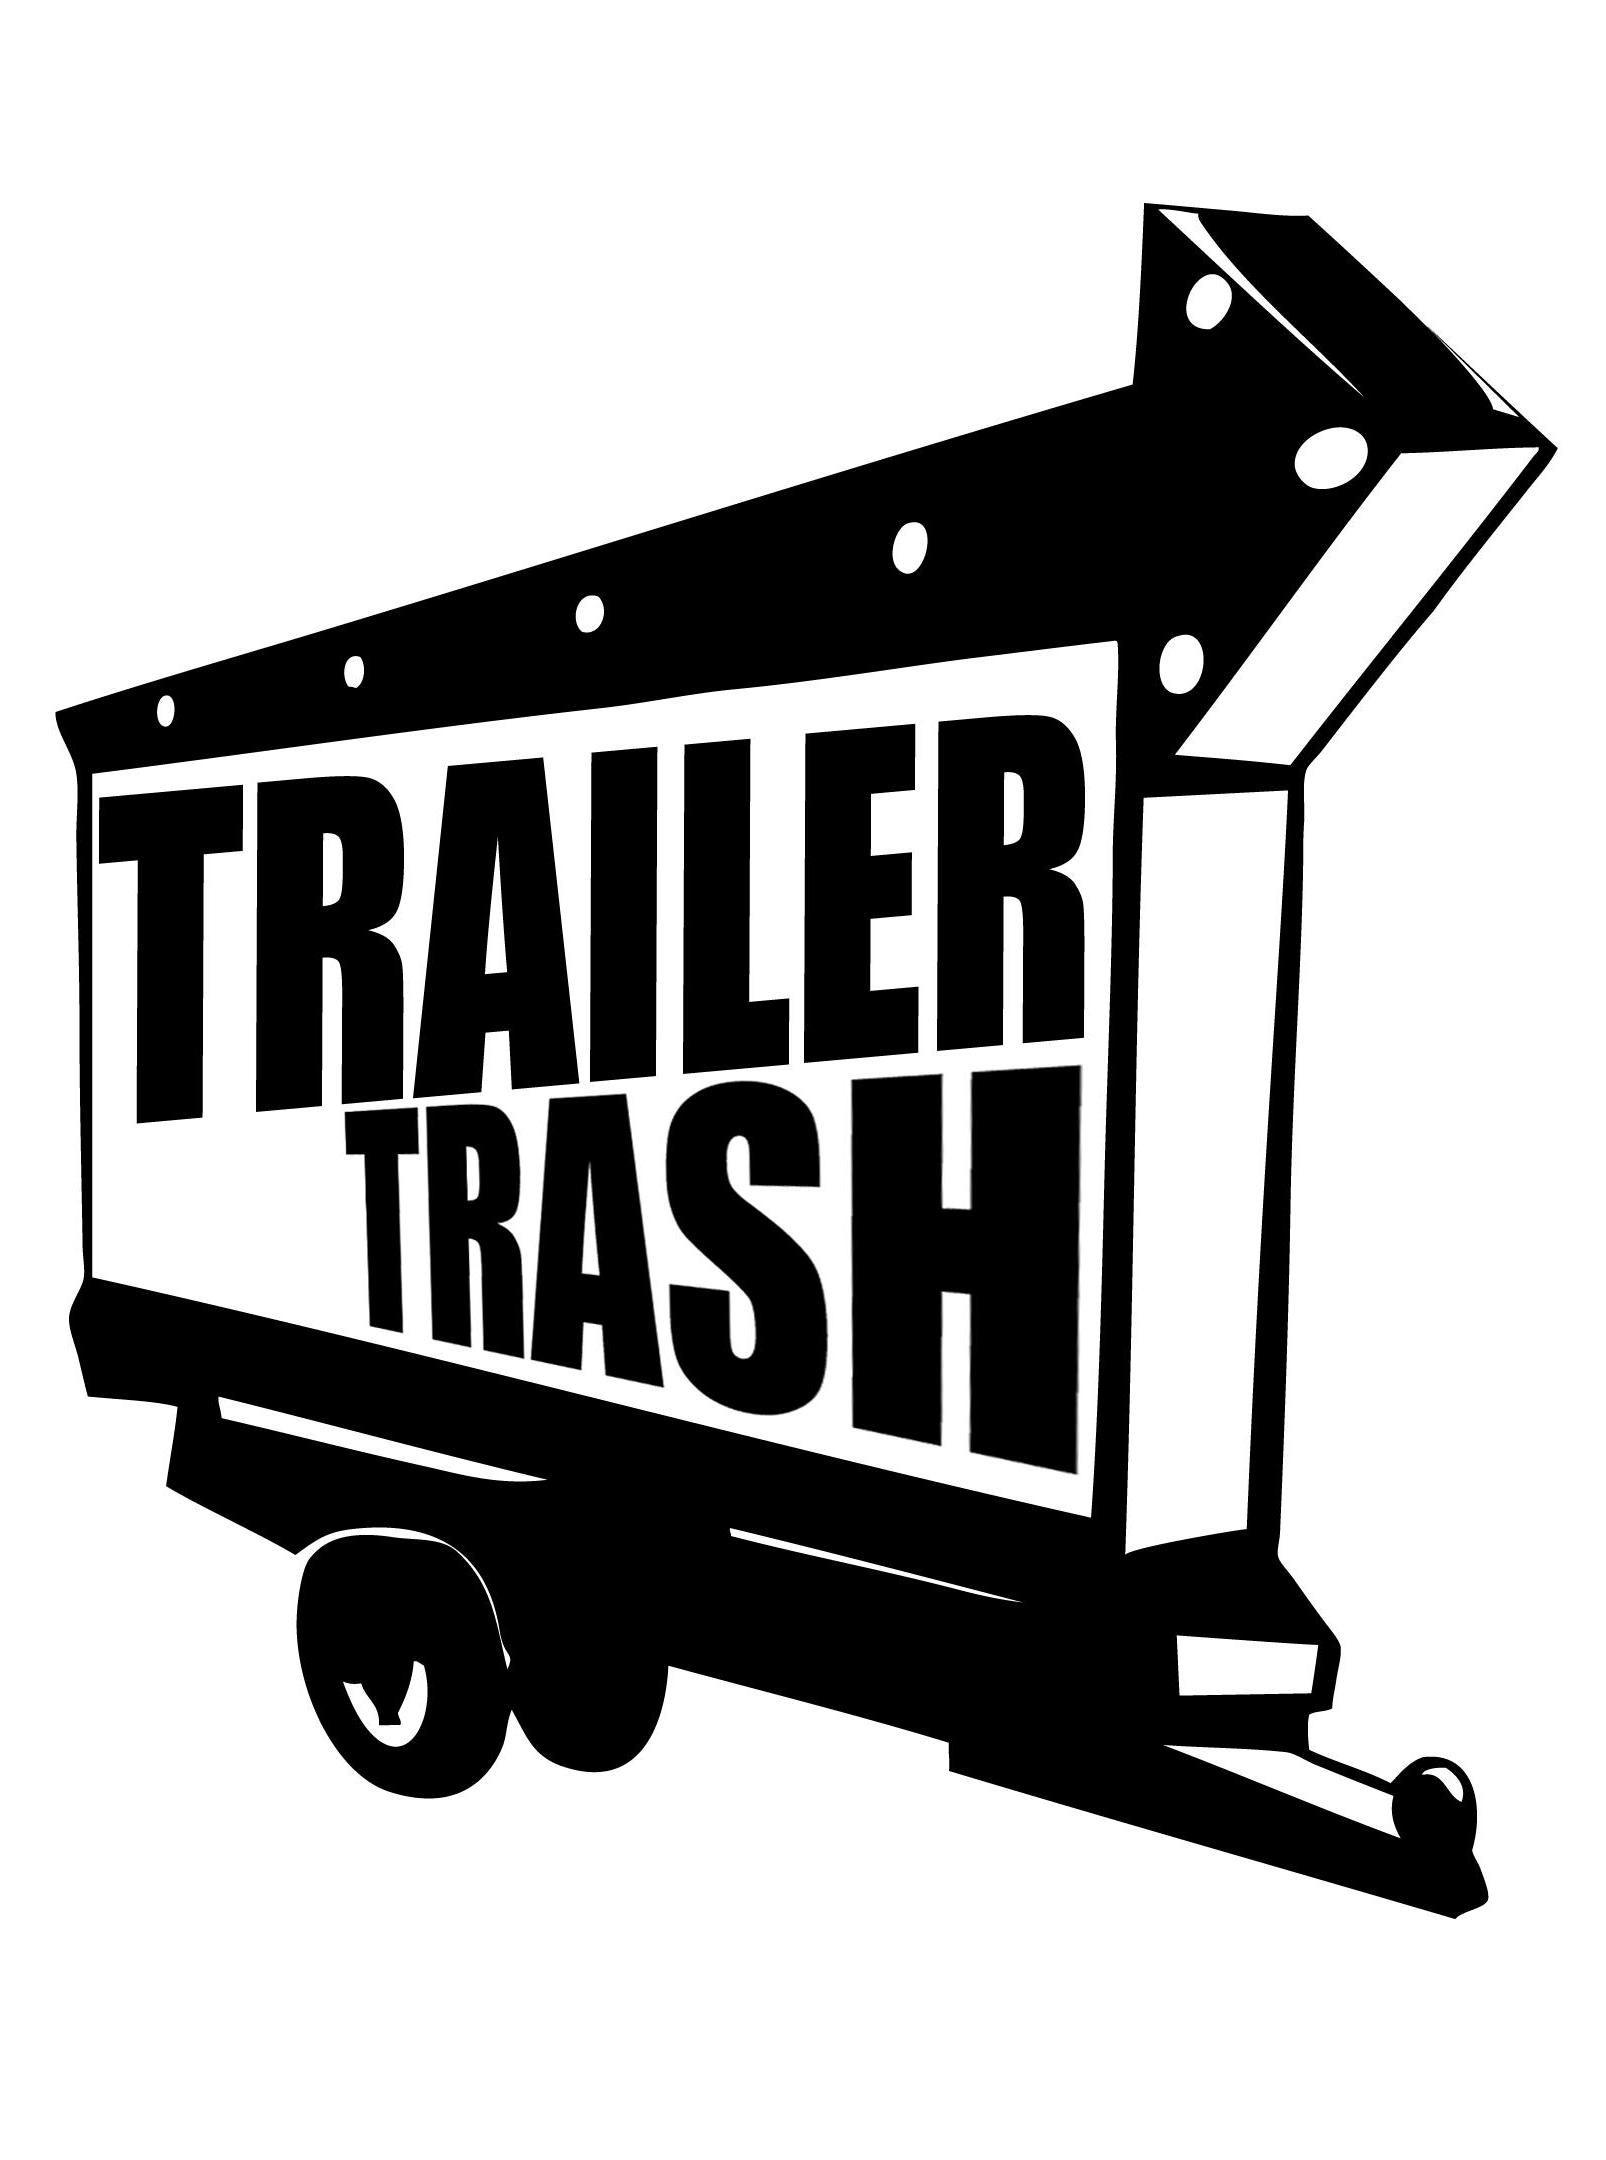 trailer trash.